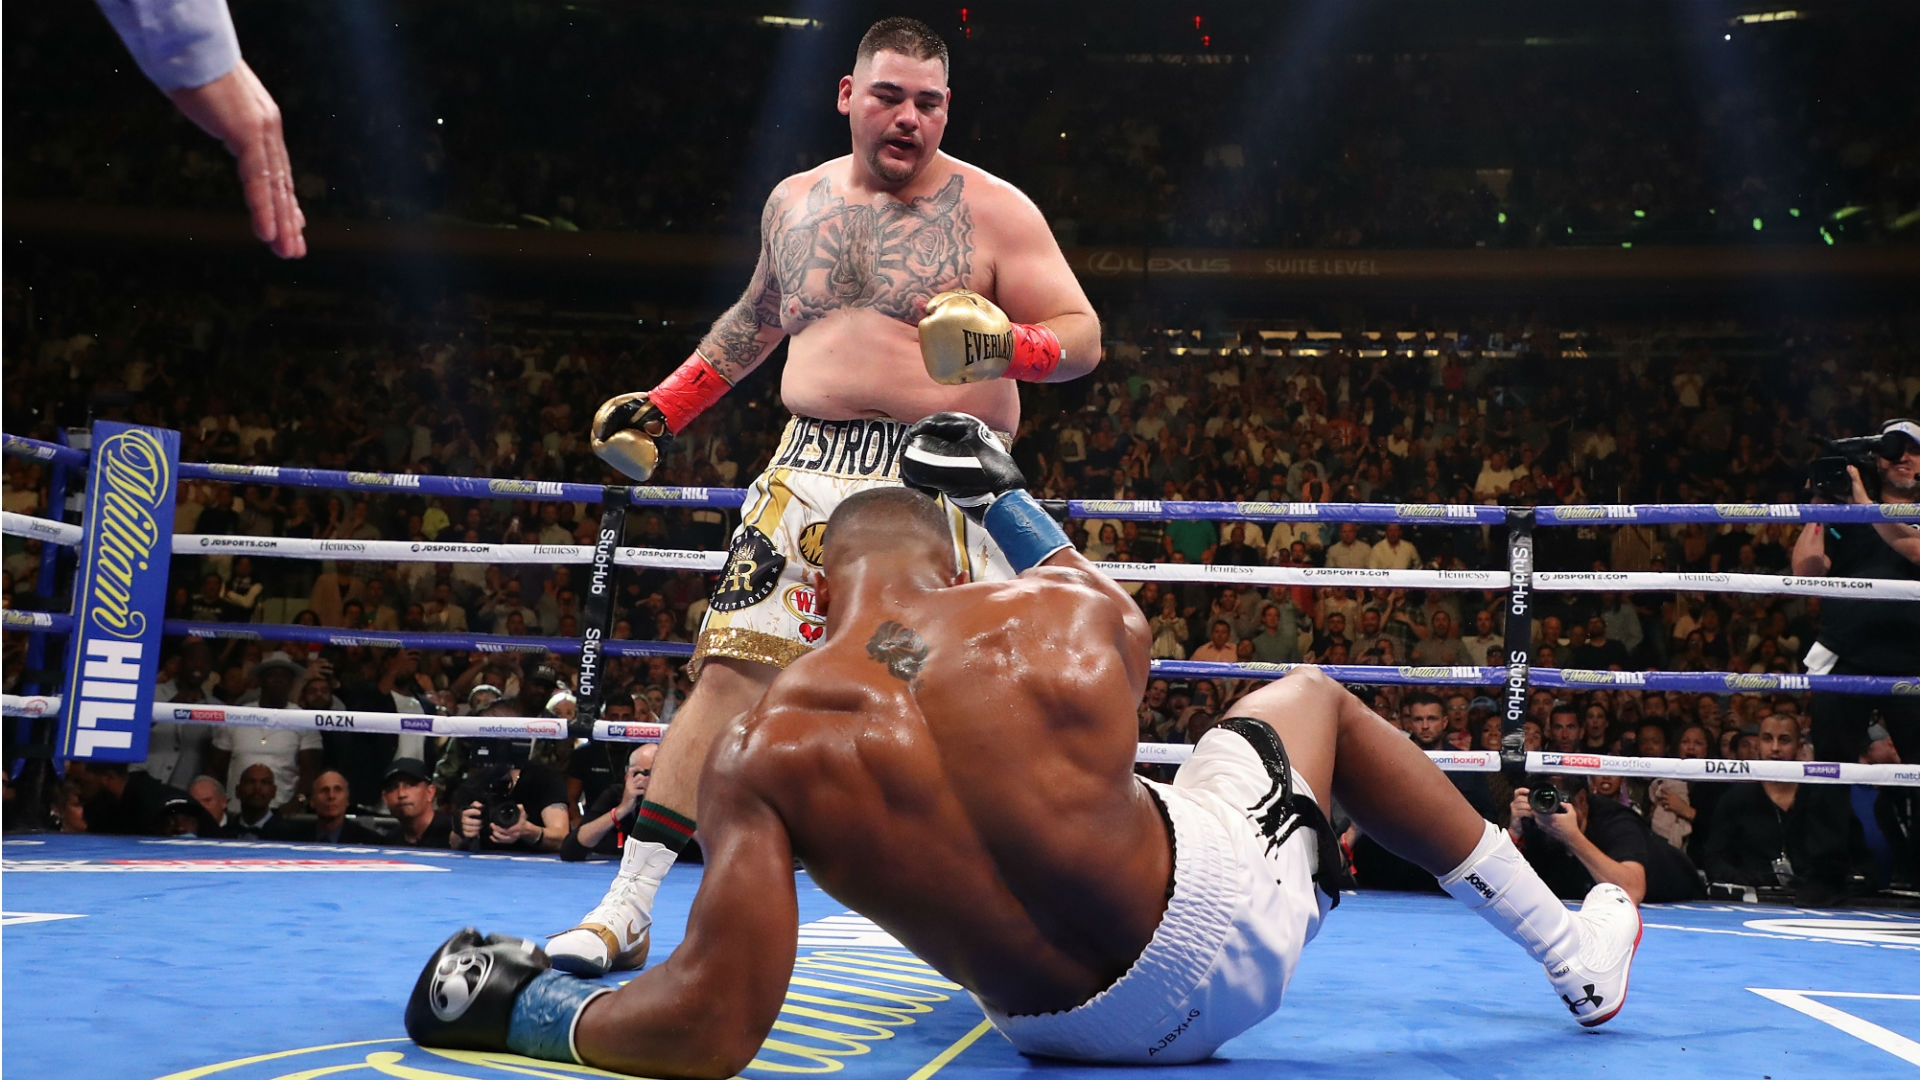 IBF/WBA/WBO heavyweight titlist Andy Ruiz (standing) vs. Anthony Joshua. Photo credit: Getty Images